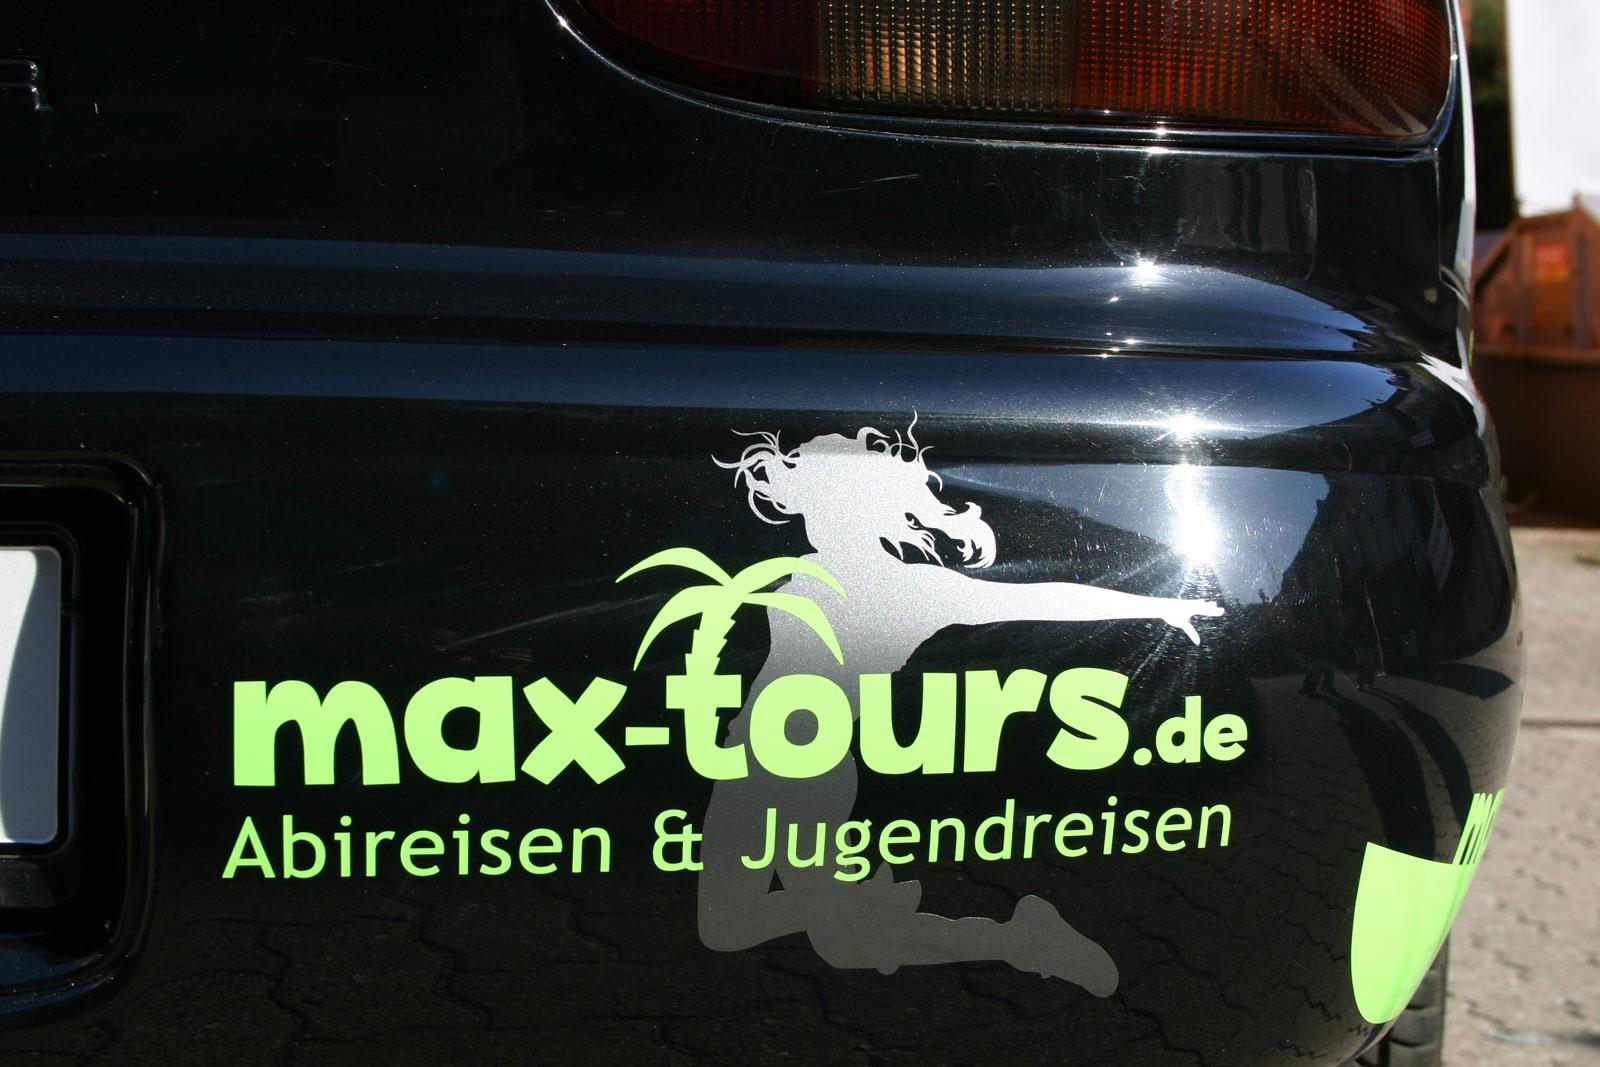 STRATUS_BEKLEBUNG_GRUEN_ANTHRAZIT_MATT_METALLIC_MAX-TOURS_20